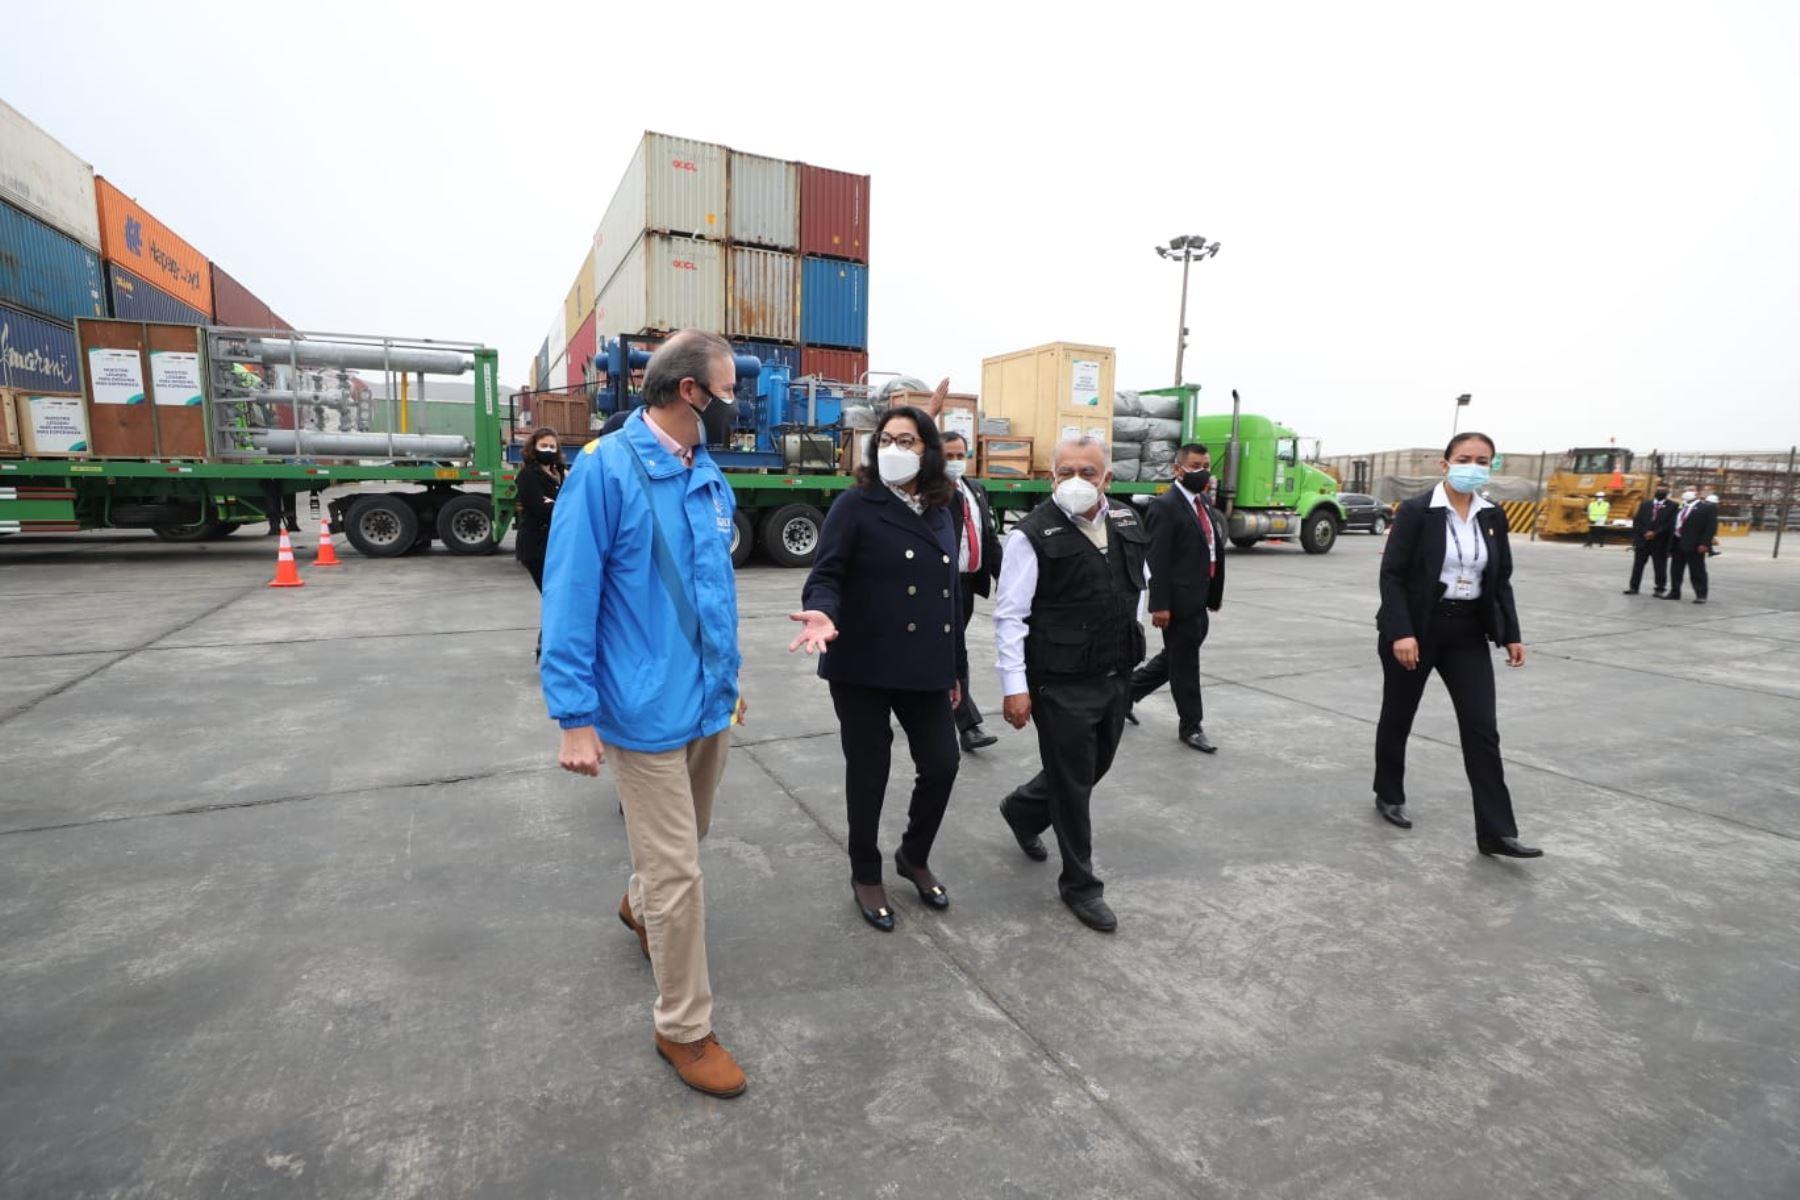 La jefa del Gabinete, Violeta Bermúdez, junto al titular del MTC, Eduardo González, supervisan la llegada de la planta criogénica-fábrica de oxígeno destinada a la ciudad de Pacasmayo, en La Libertad. Foto: ANDINA/PCM